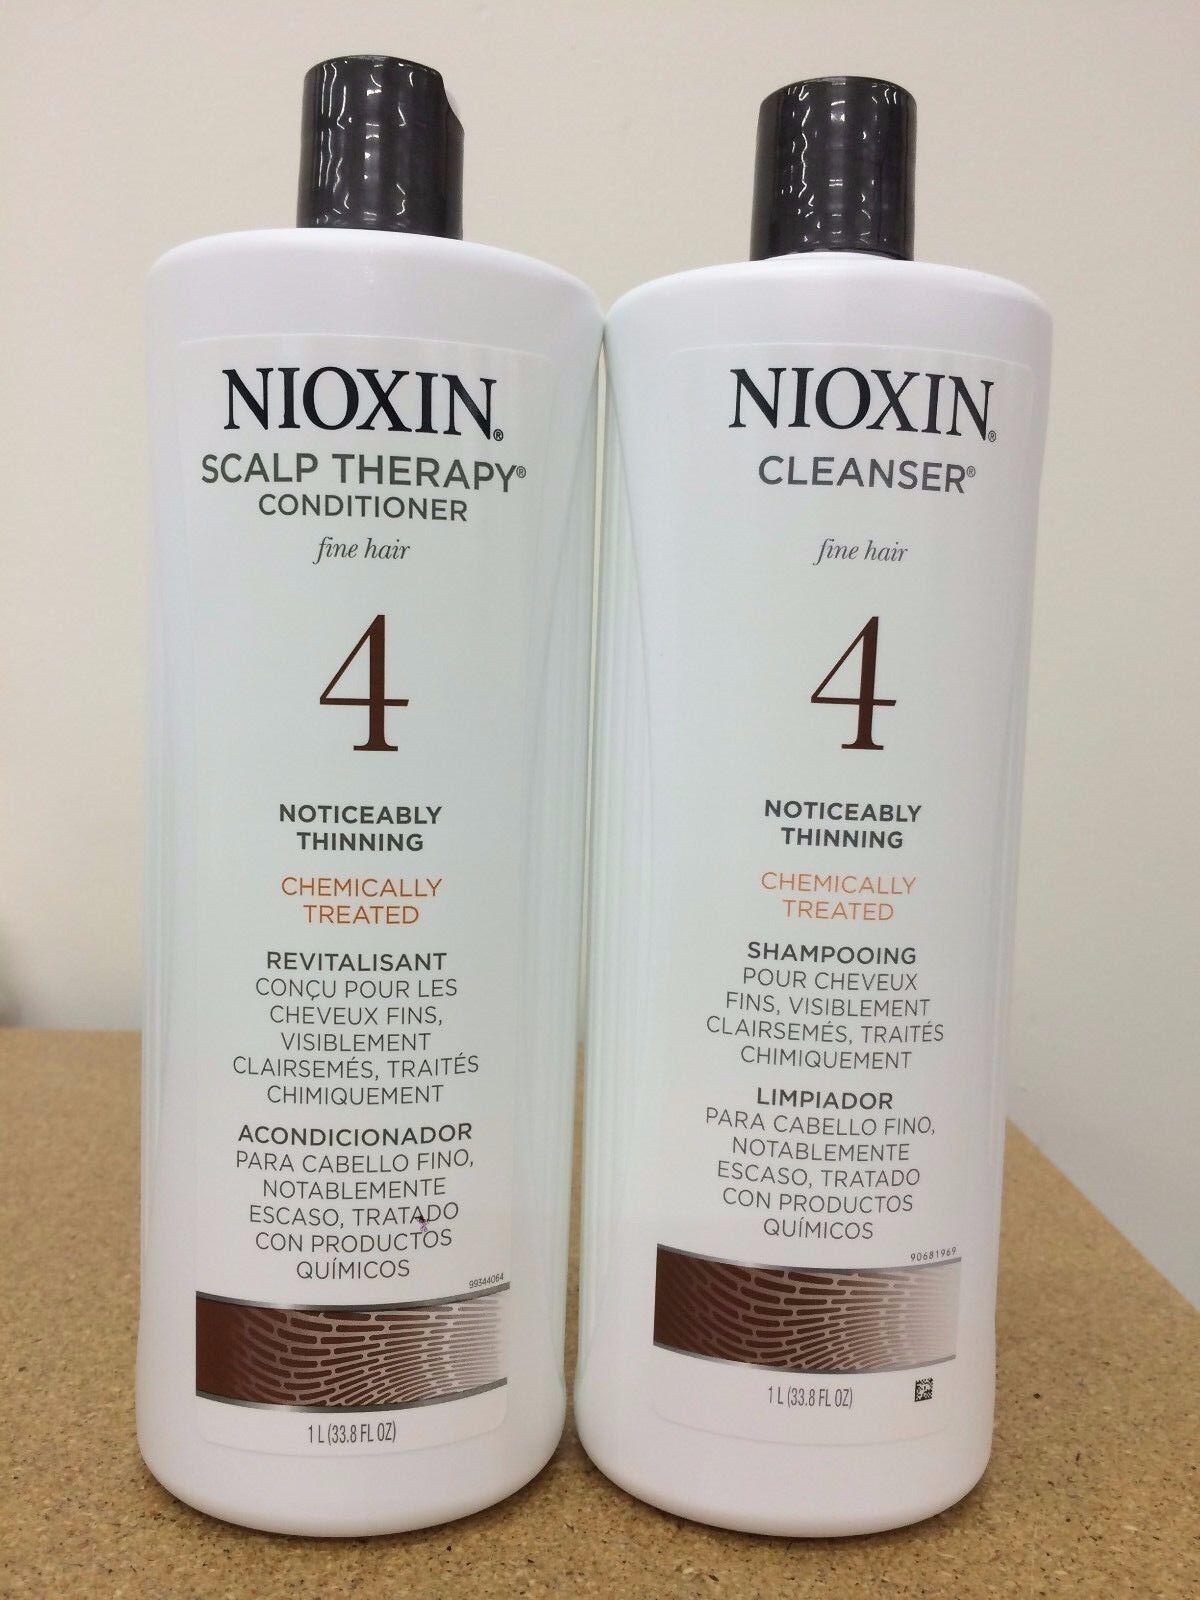 NIOXIN by Nioxin